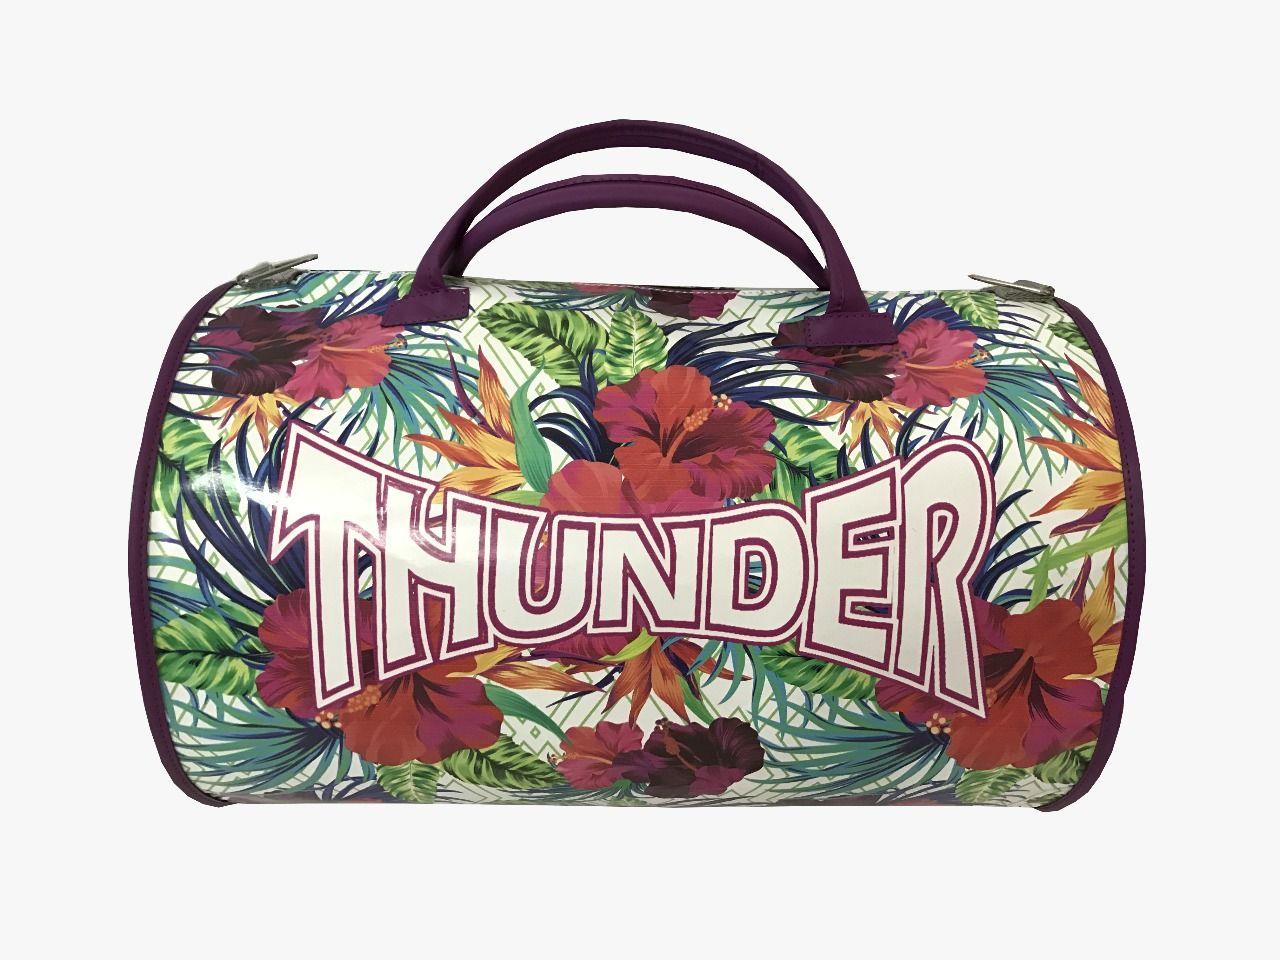 Bolsa Kimono Muay Thai Boxe Fitness Academia - Tropical Roxa - Thunder  - PRALUTA SHOP